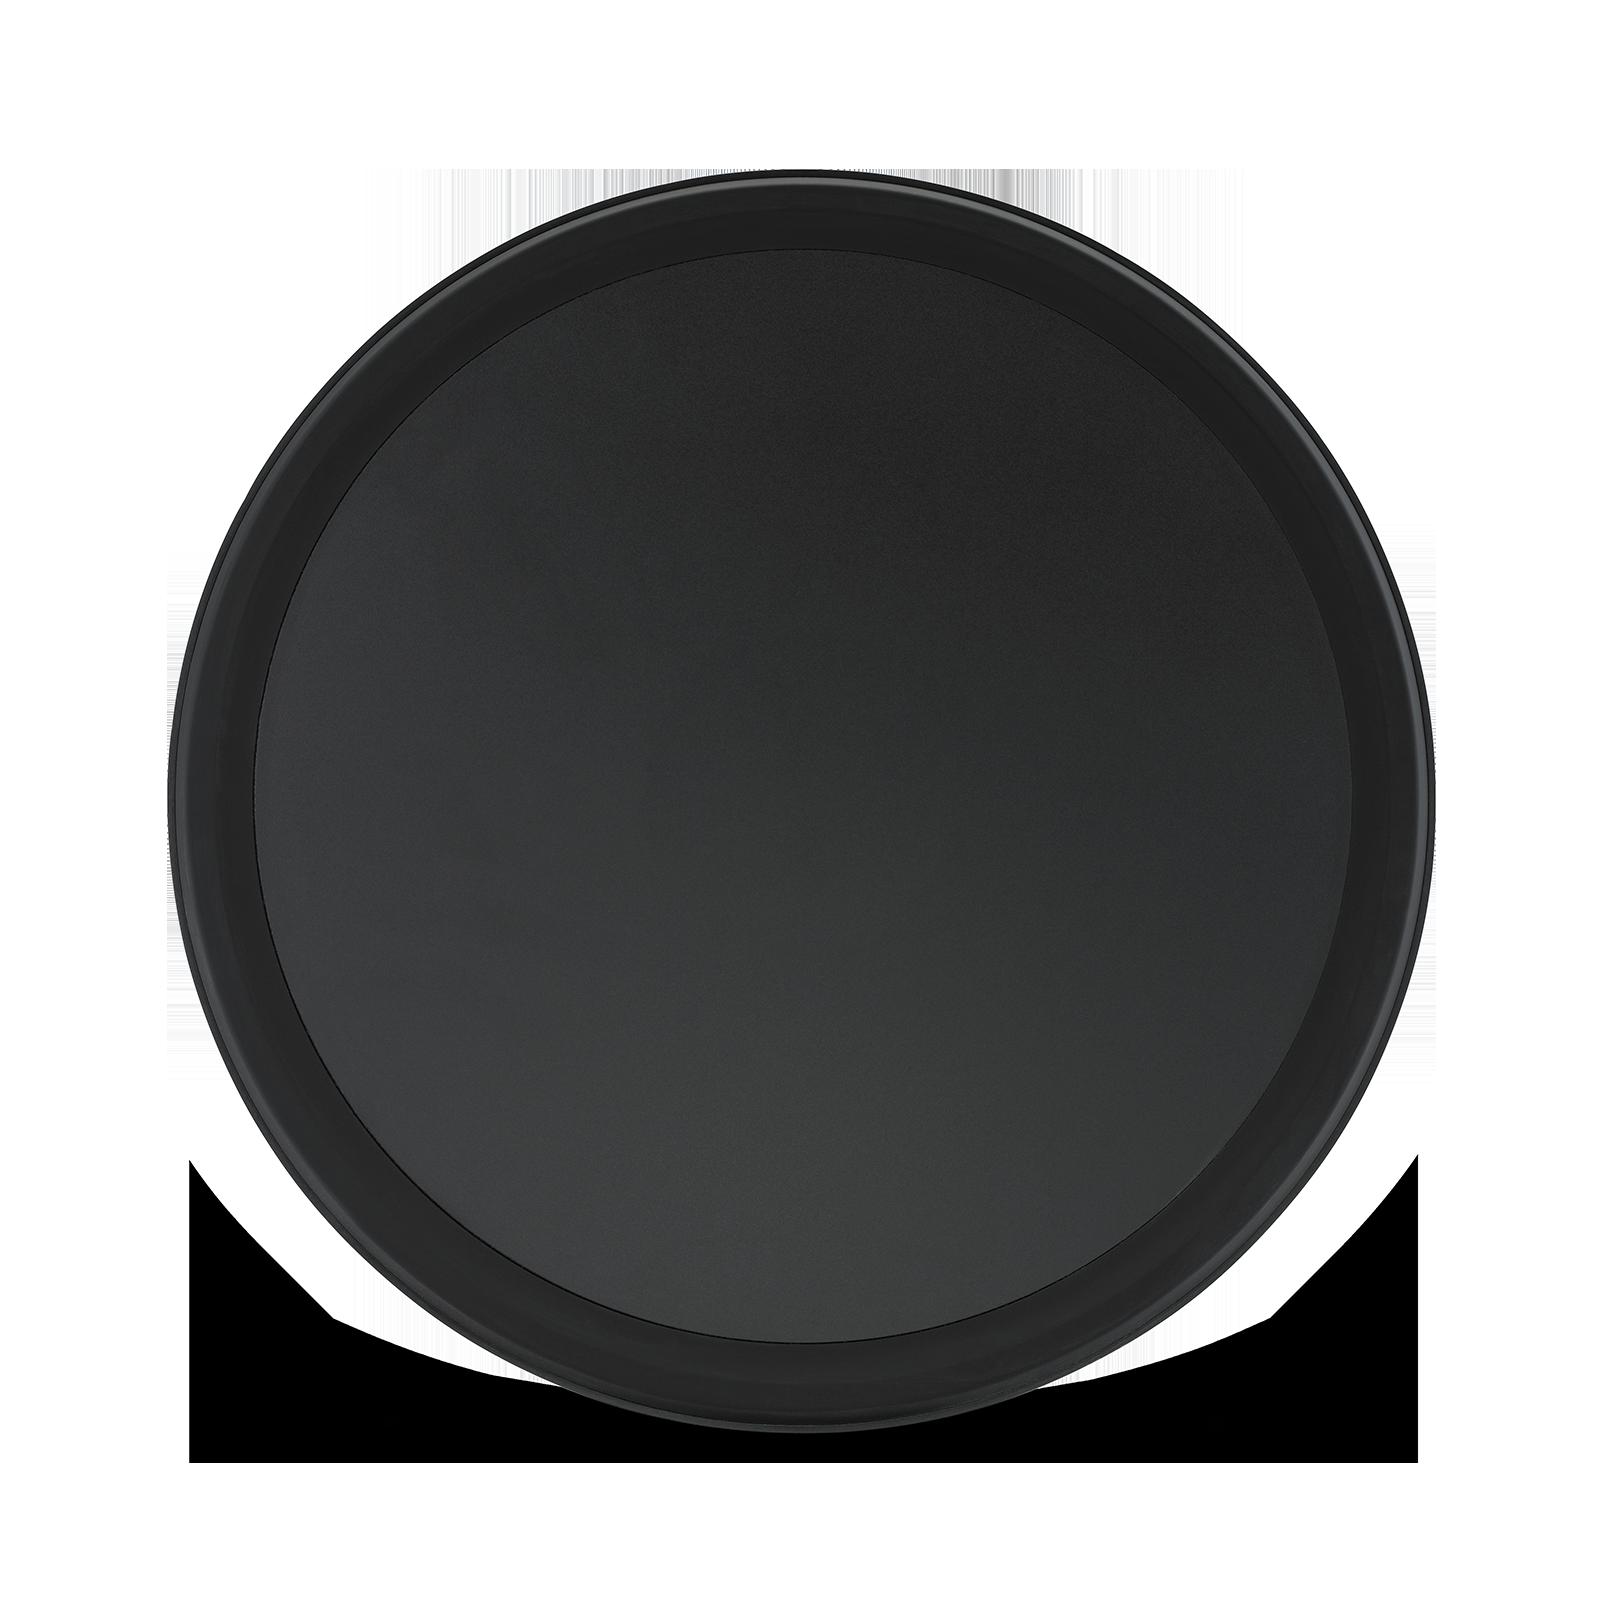 Harman Kardon Citation Tower - Black - Smart Premium Floorstanding Speaker that delivers an impactful performance - Detailshot 4